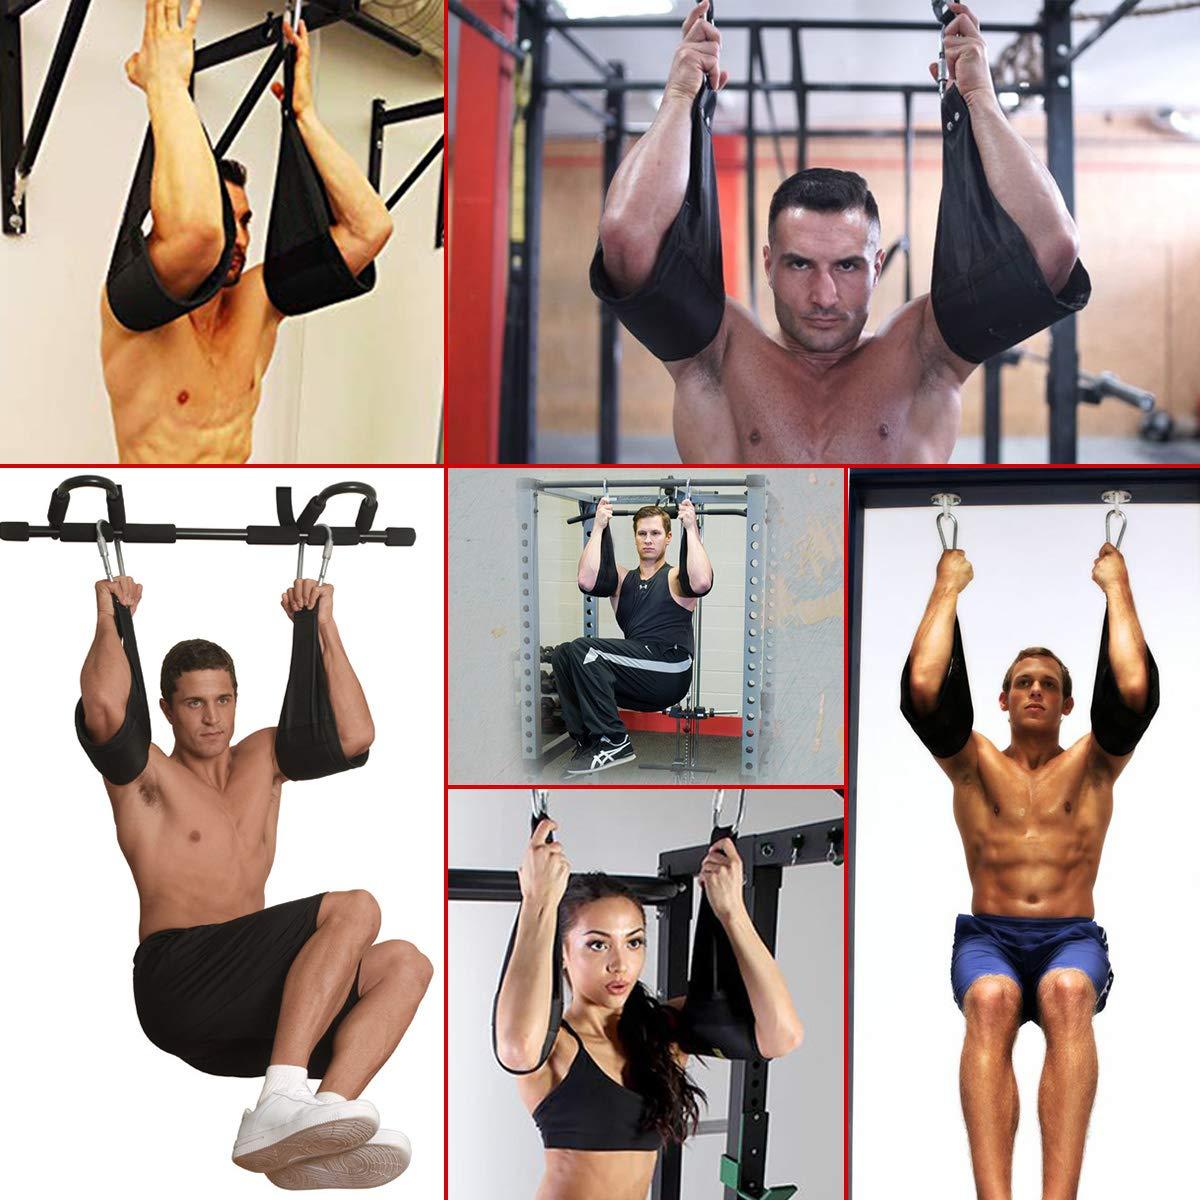 Flytool Ab Straps Core Exercise Equipment Training Gym Abdominal Hanging Straps, Black by Flytool (Image #7)